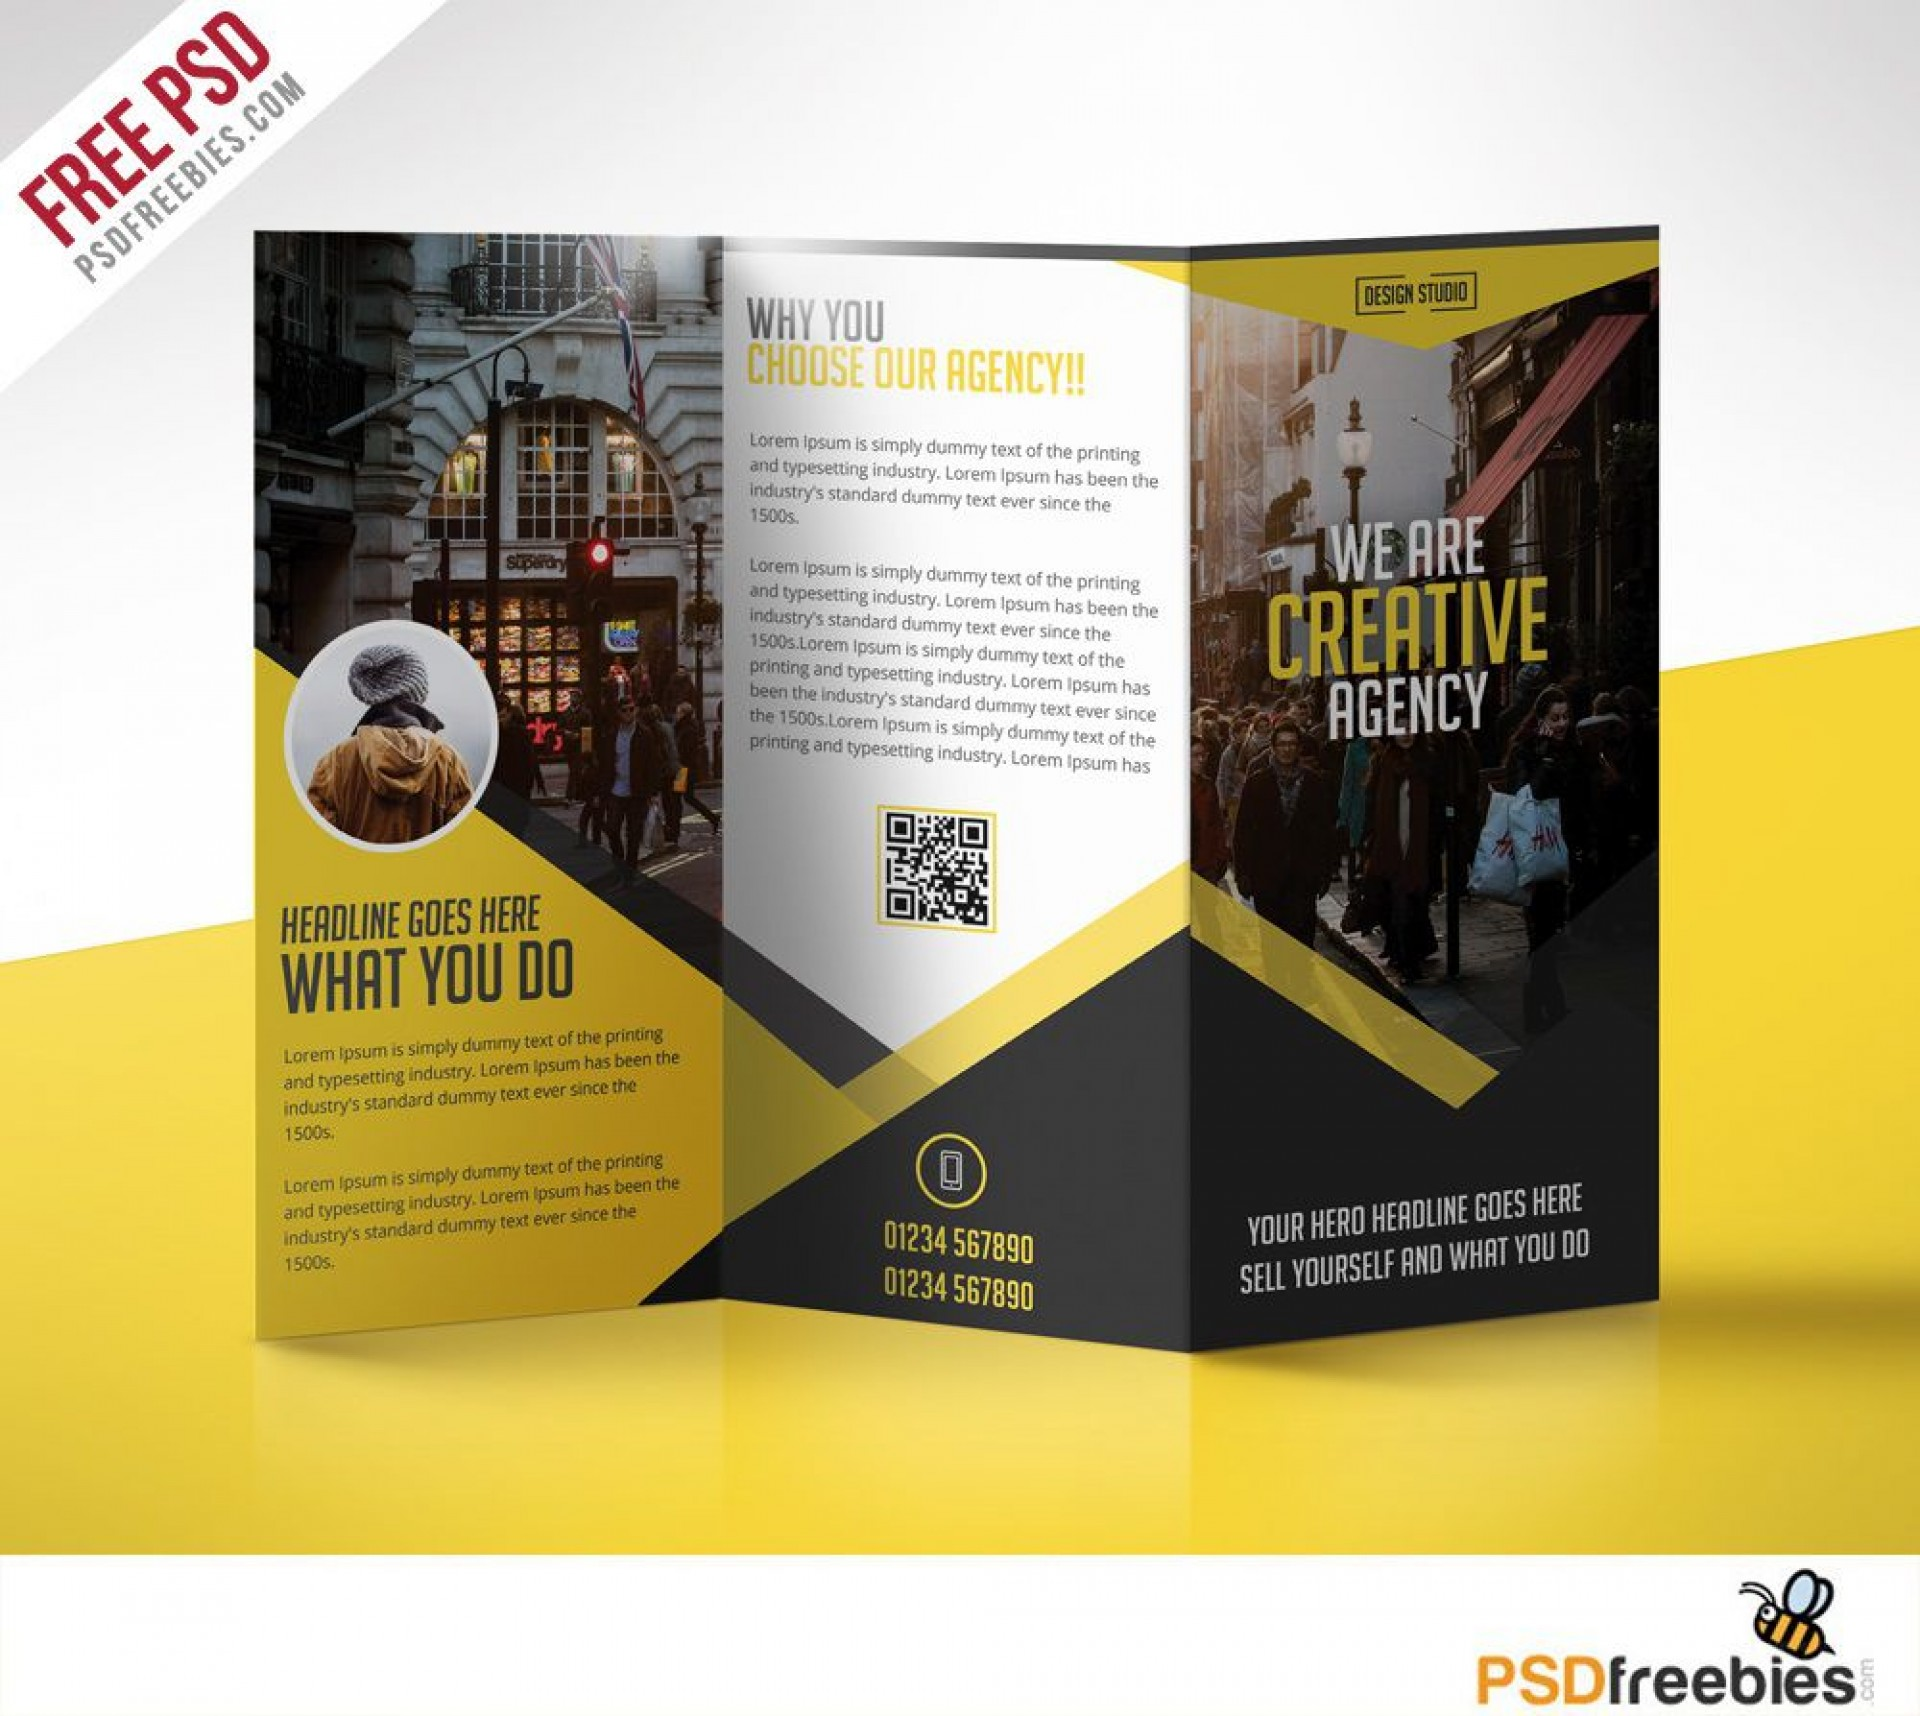 007 Impressive Free Tri Fold Brochure Template Sample  Photoshop Illustrator Microsoft Word 20101920